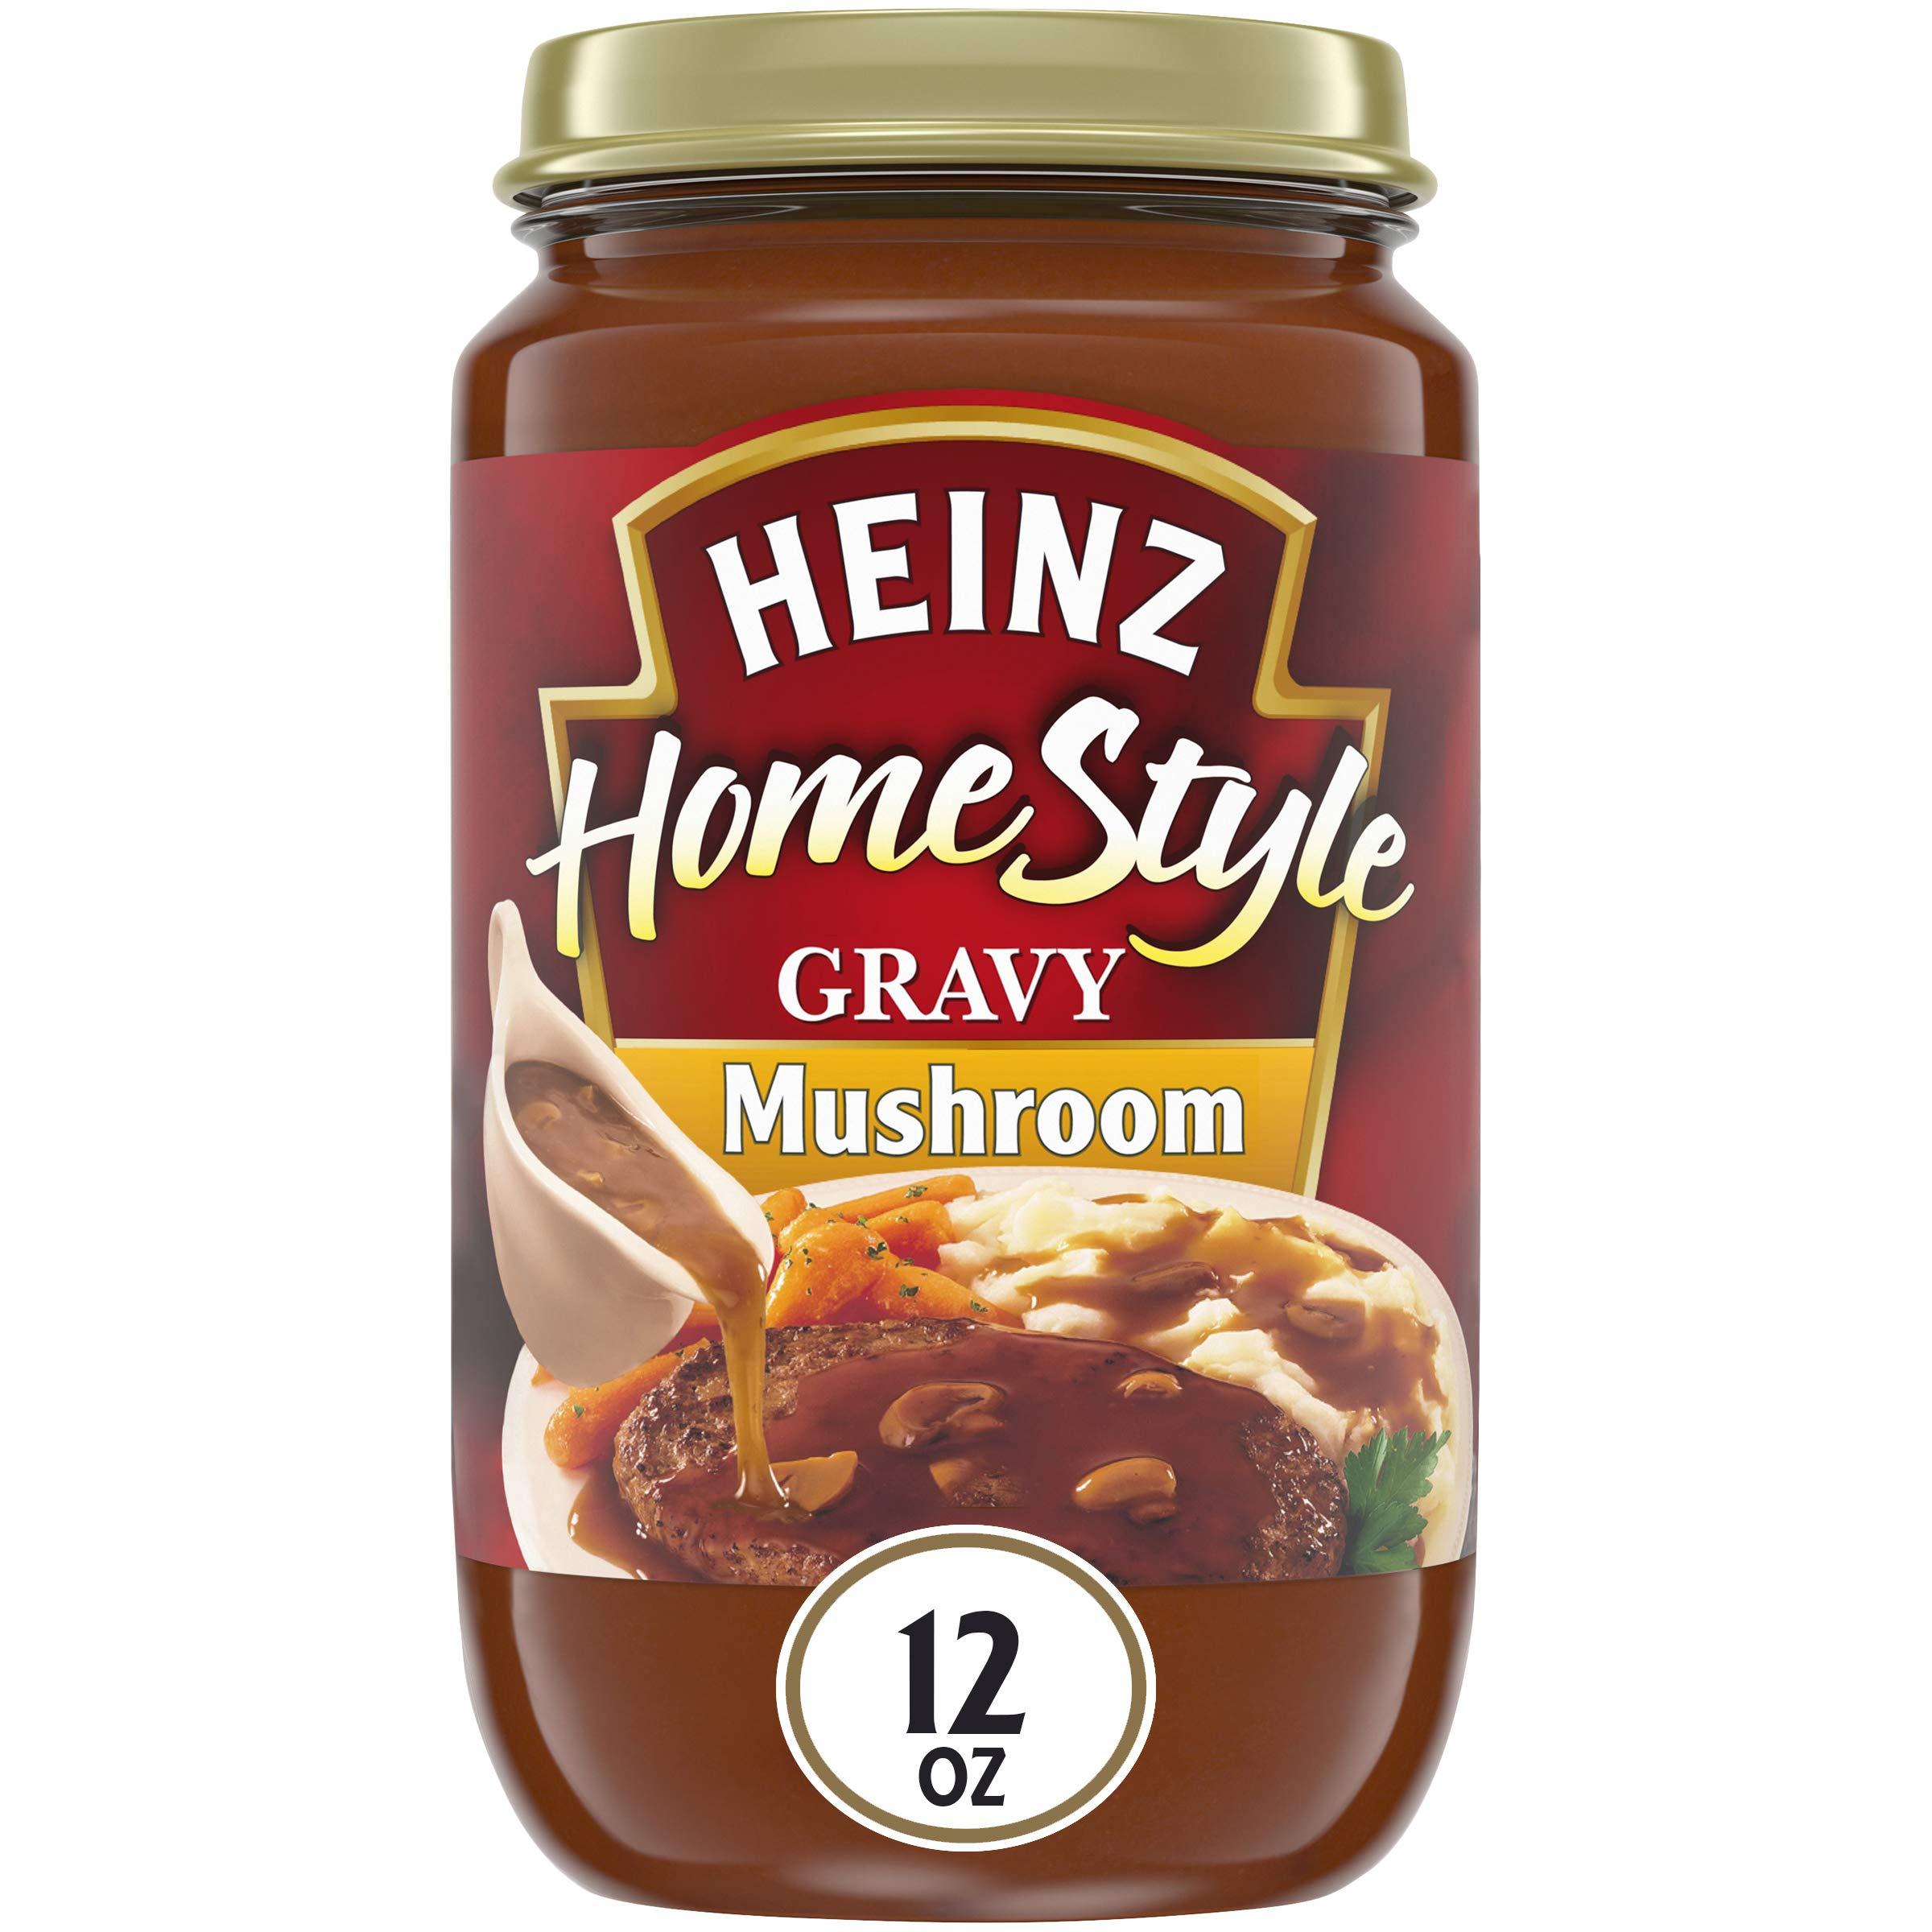 Heinz Homestyle, Mushroom Gravy, 12 oz